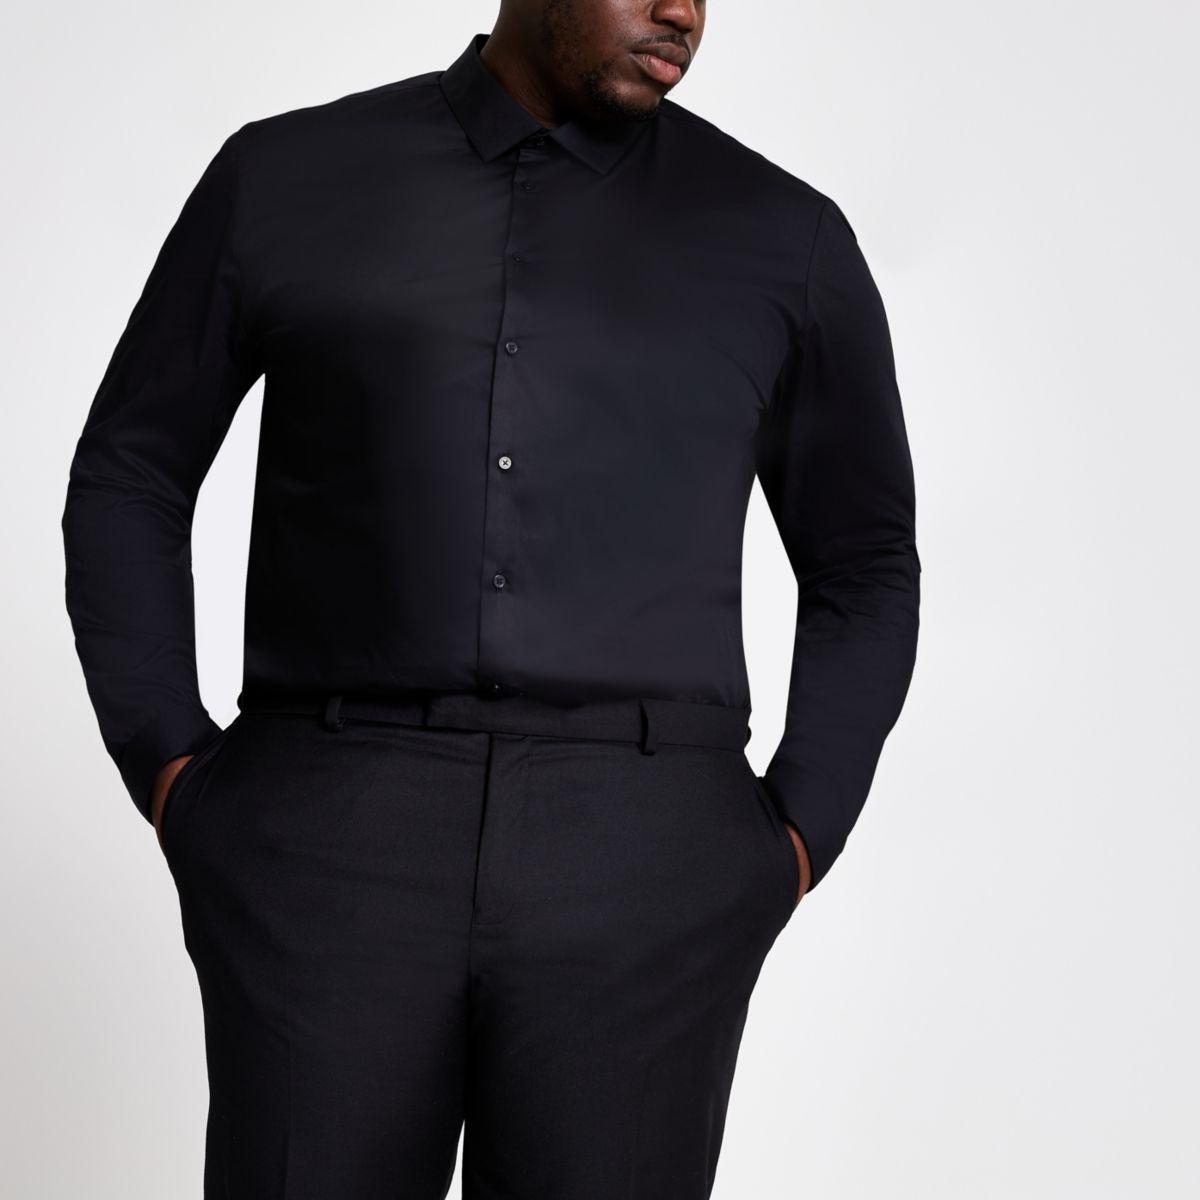 RI Big and Tall - Zwart overhemd met lange mouwen